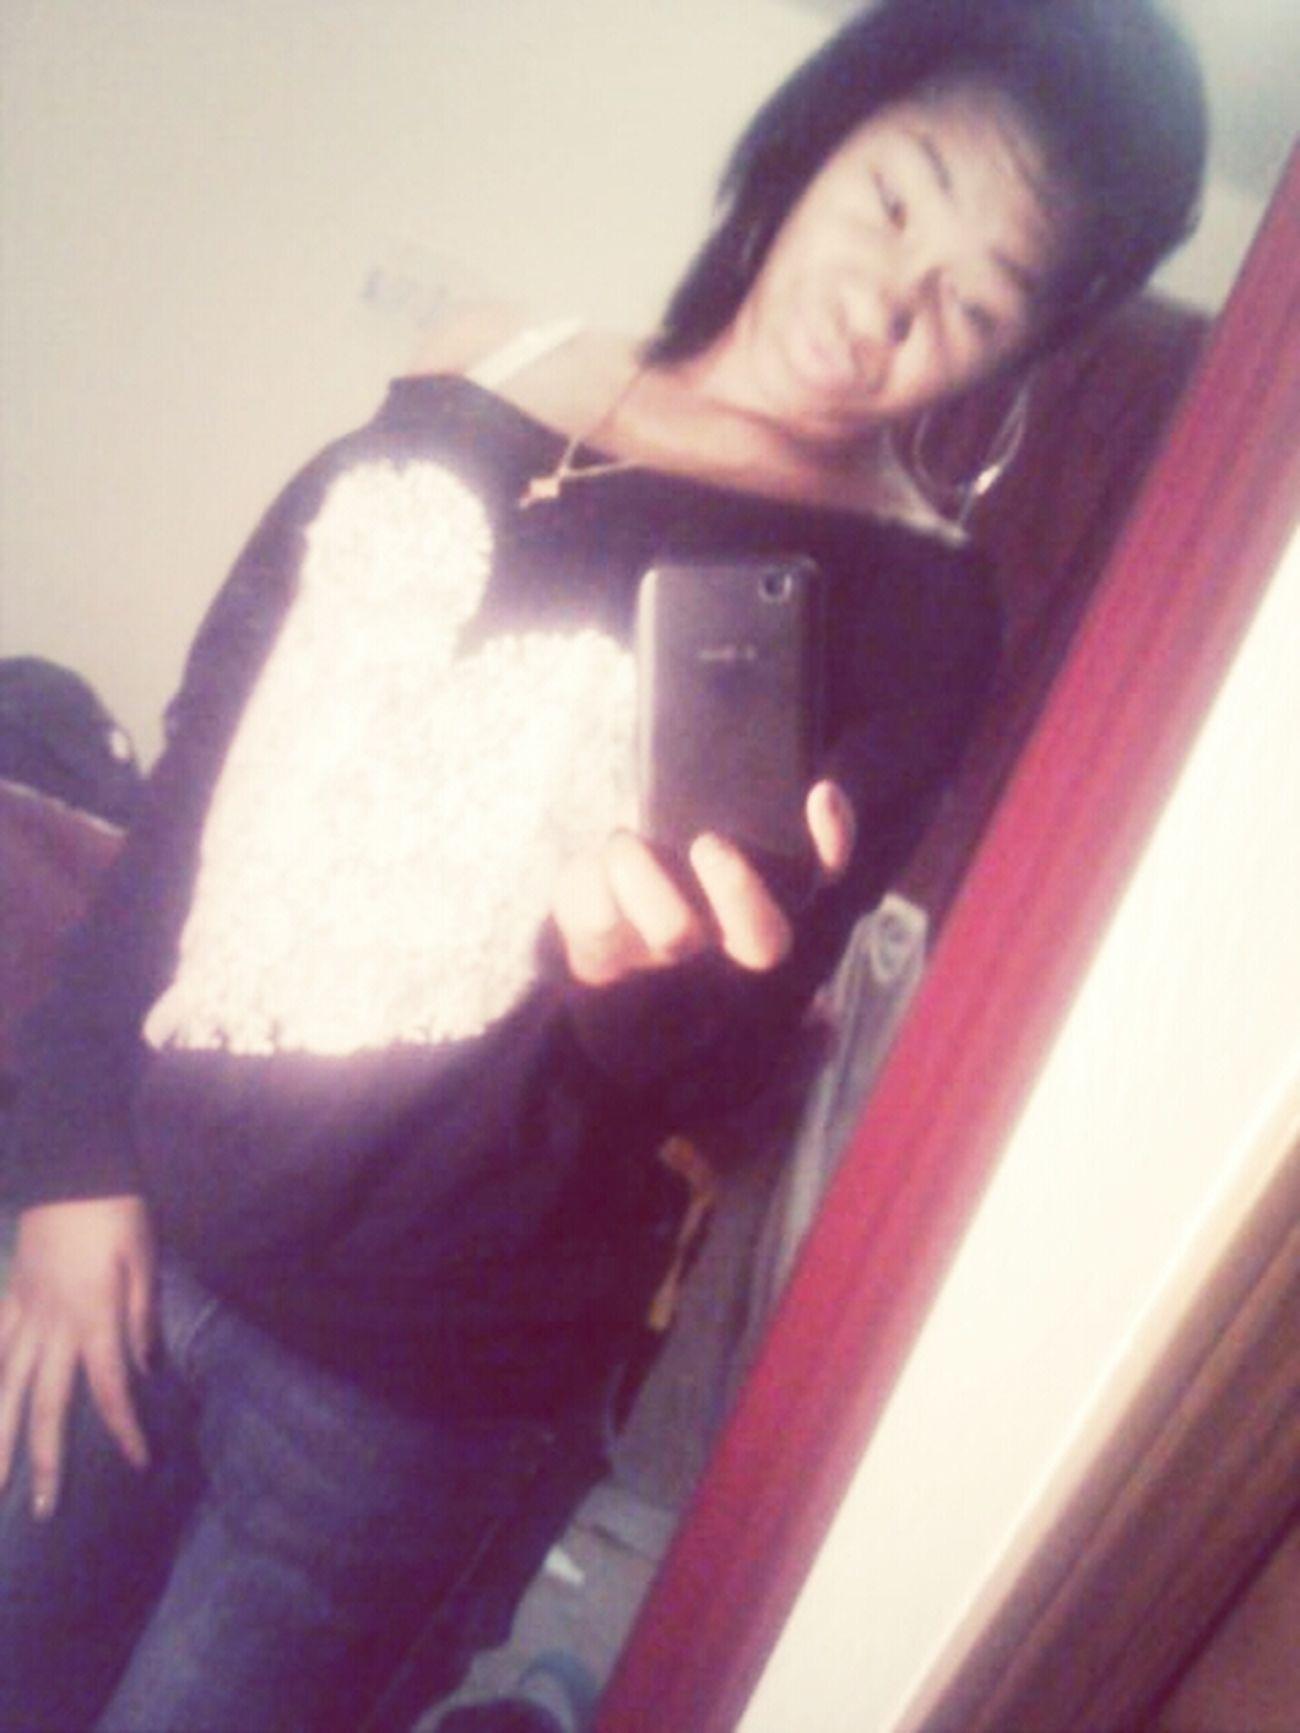 My Face Thoo Lol